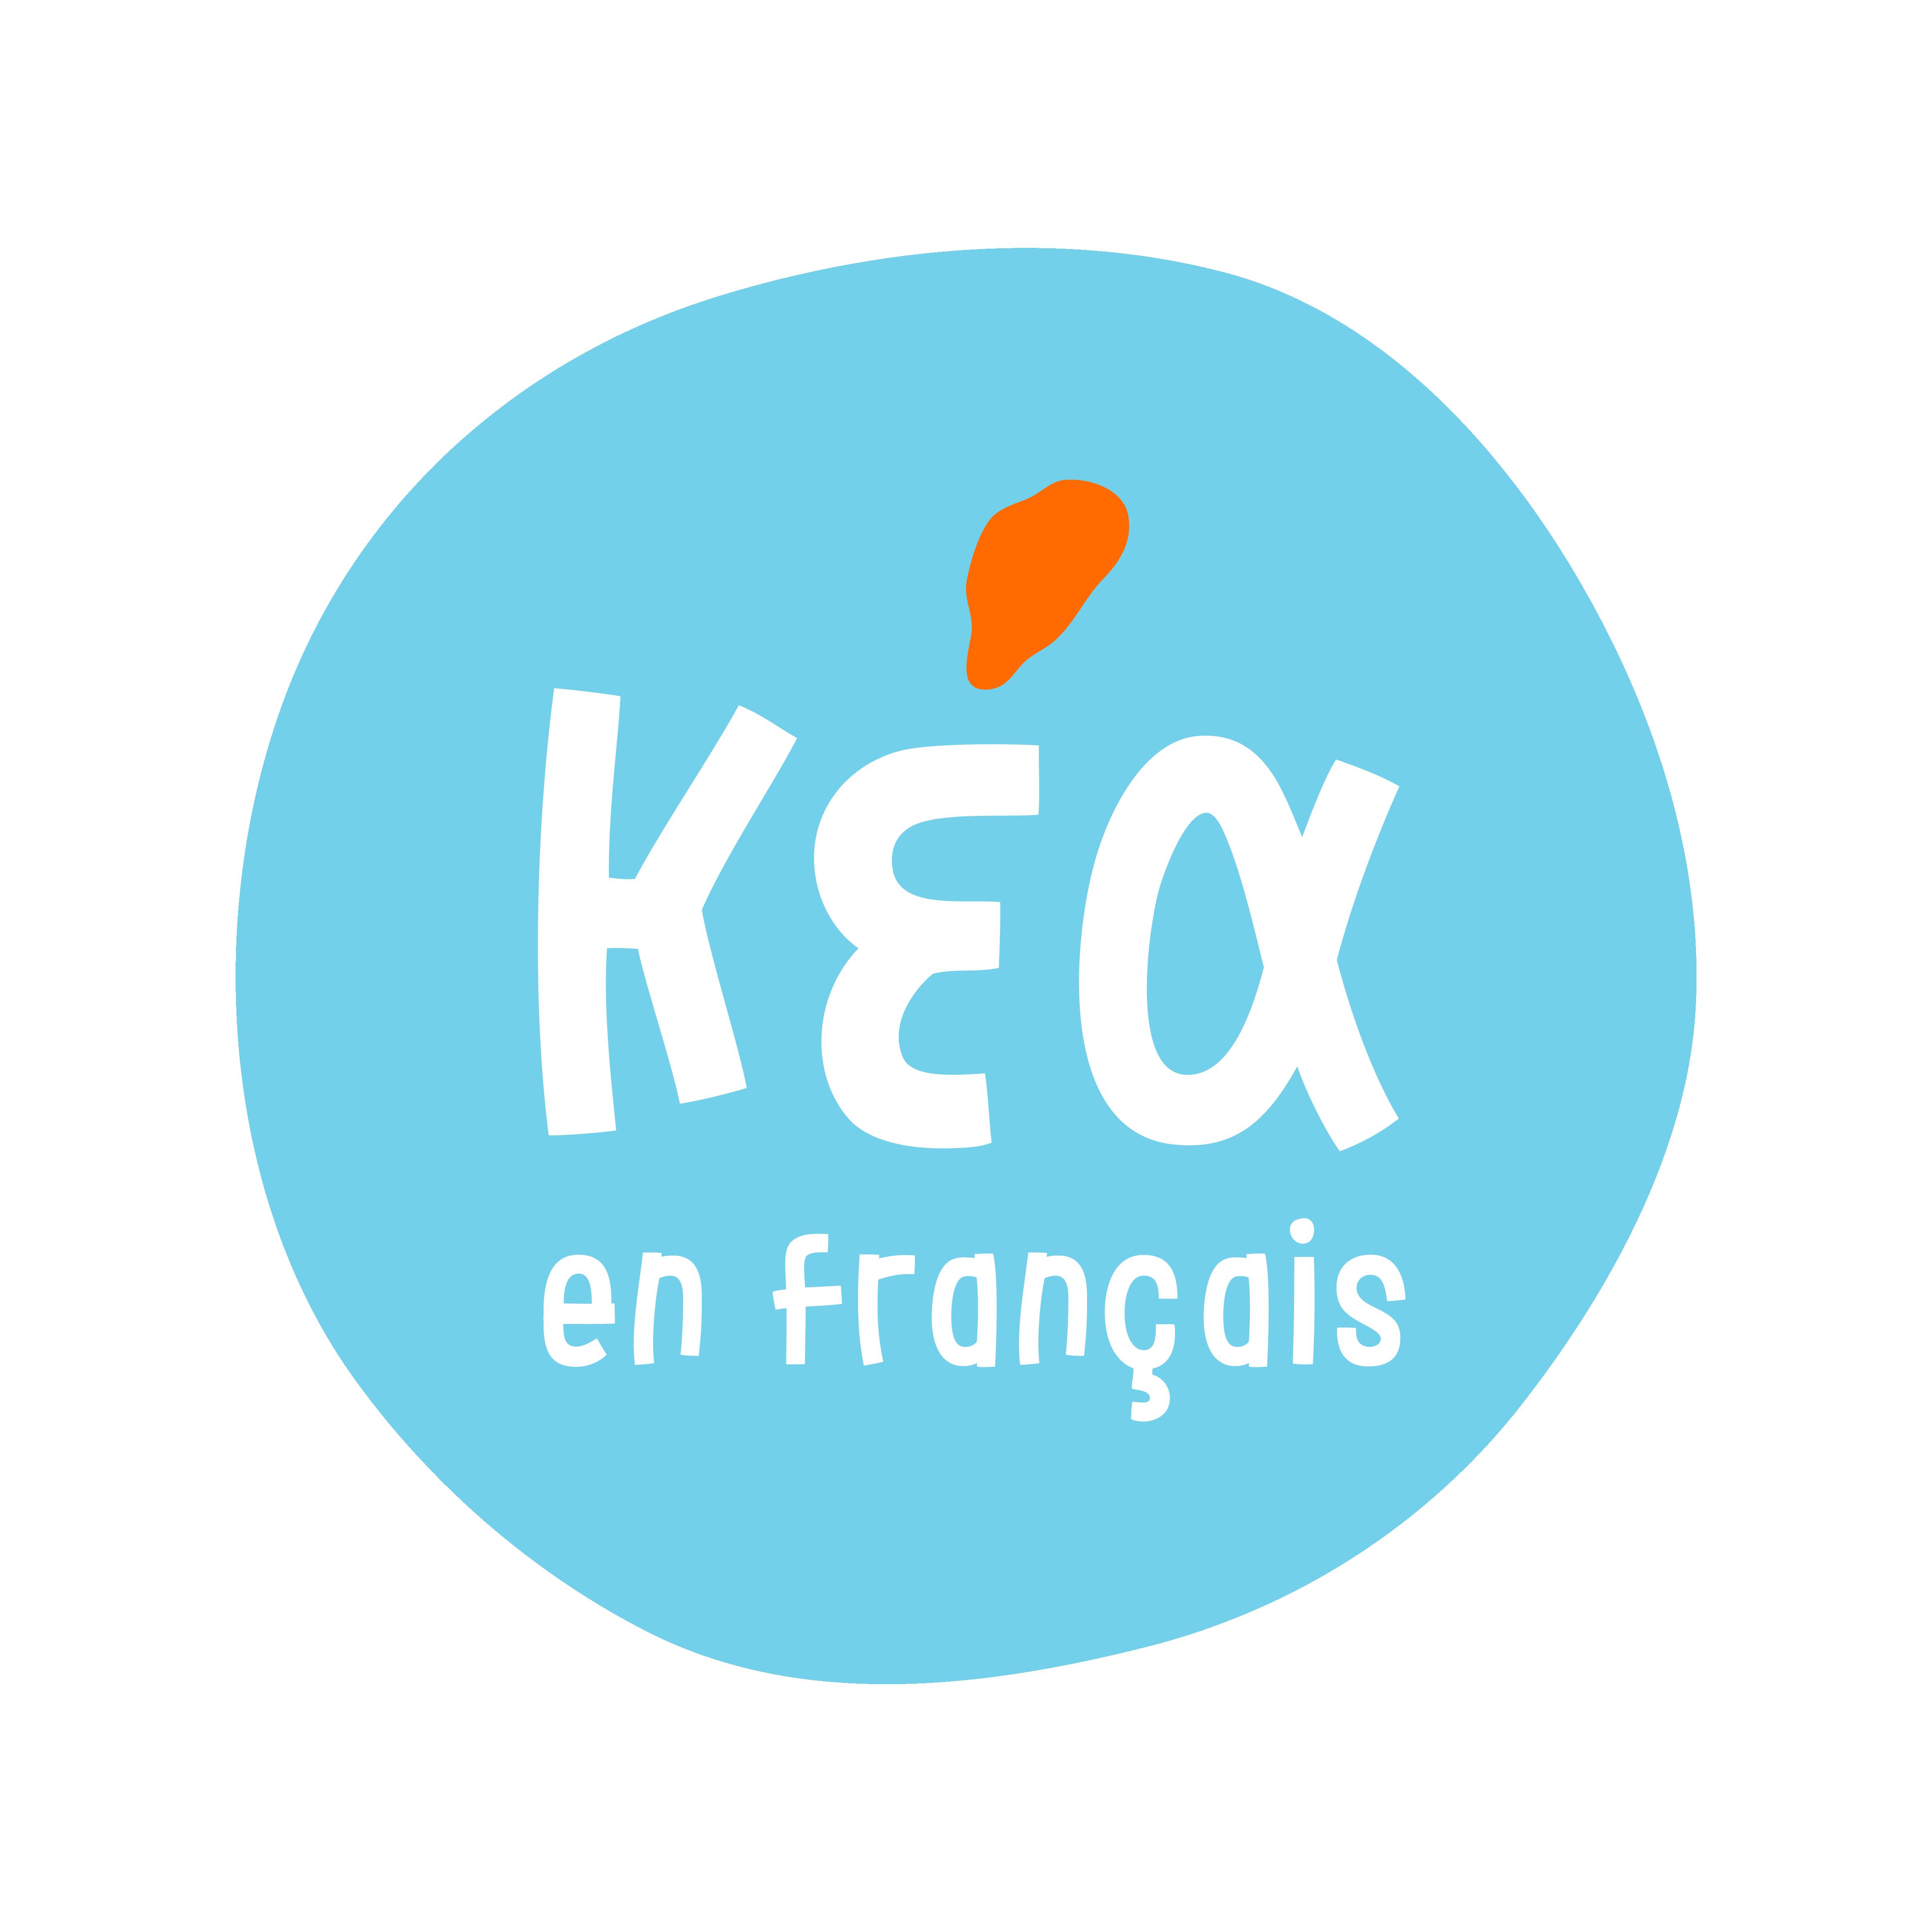 kea-enfrancais.gr